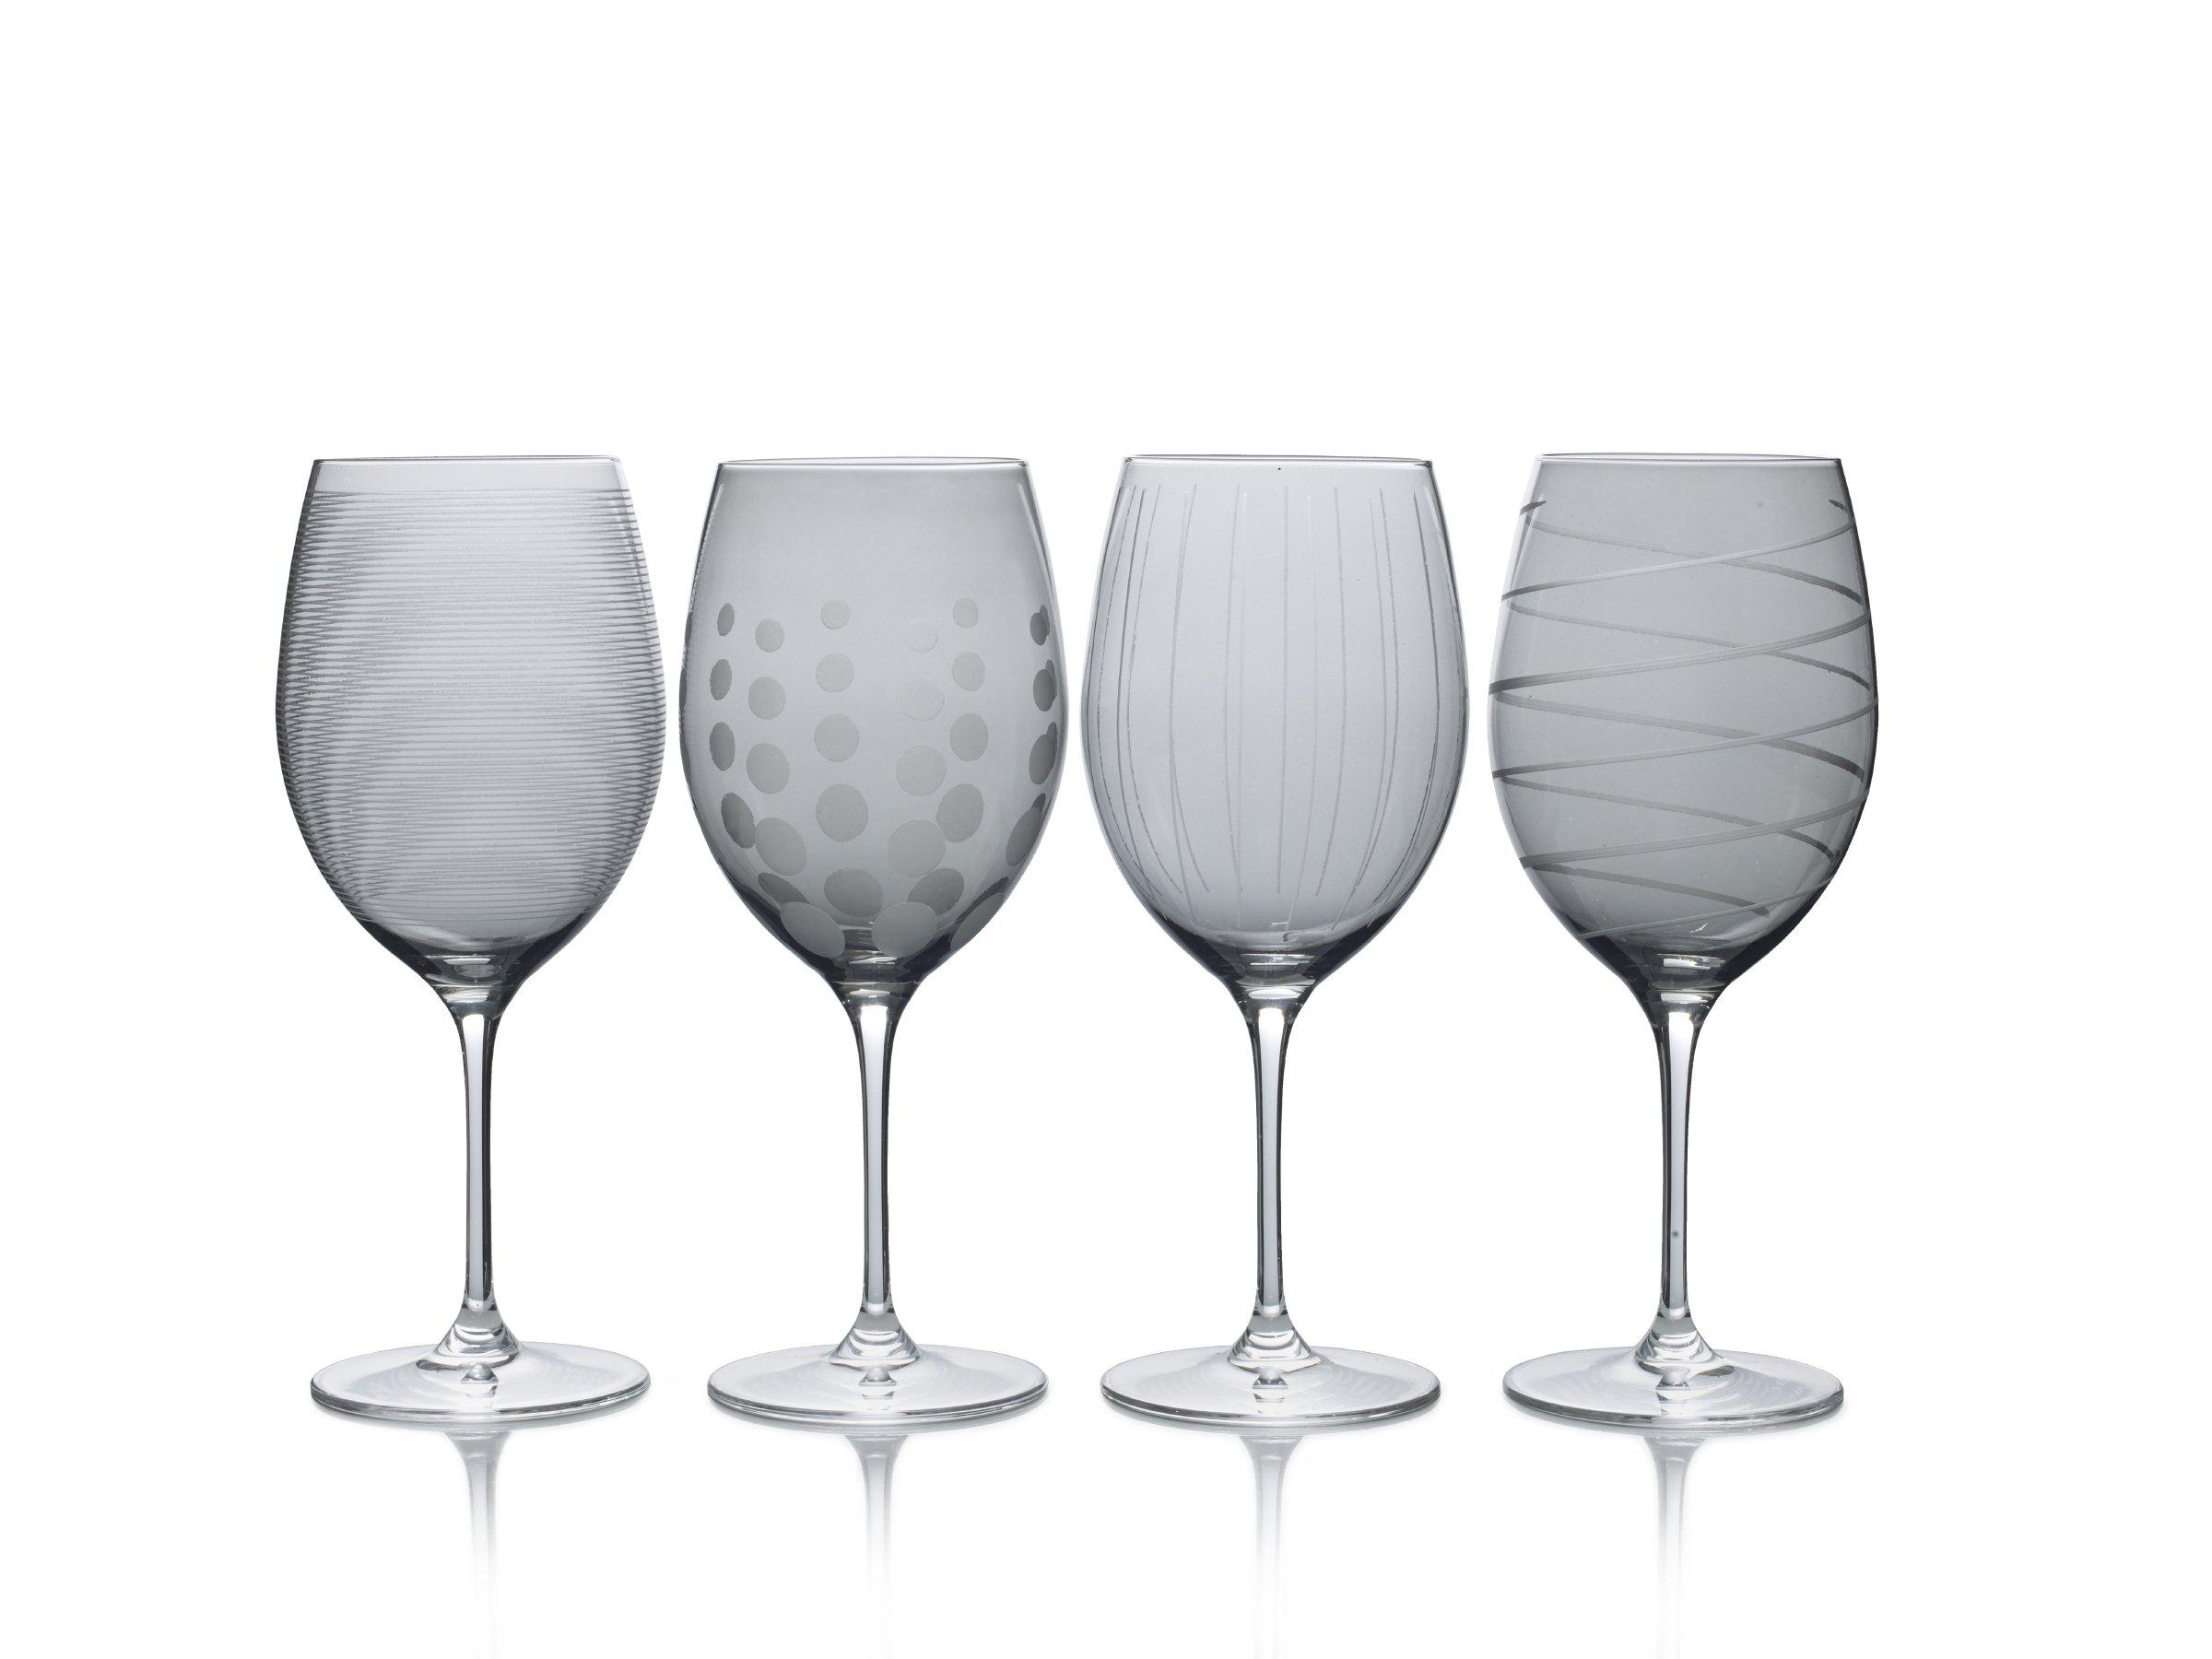 Mikasa Cheers Smoke Wine Glass, 24-Ounce, Set of 4